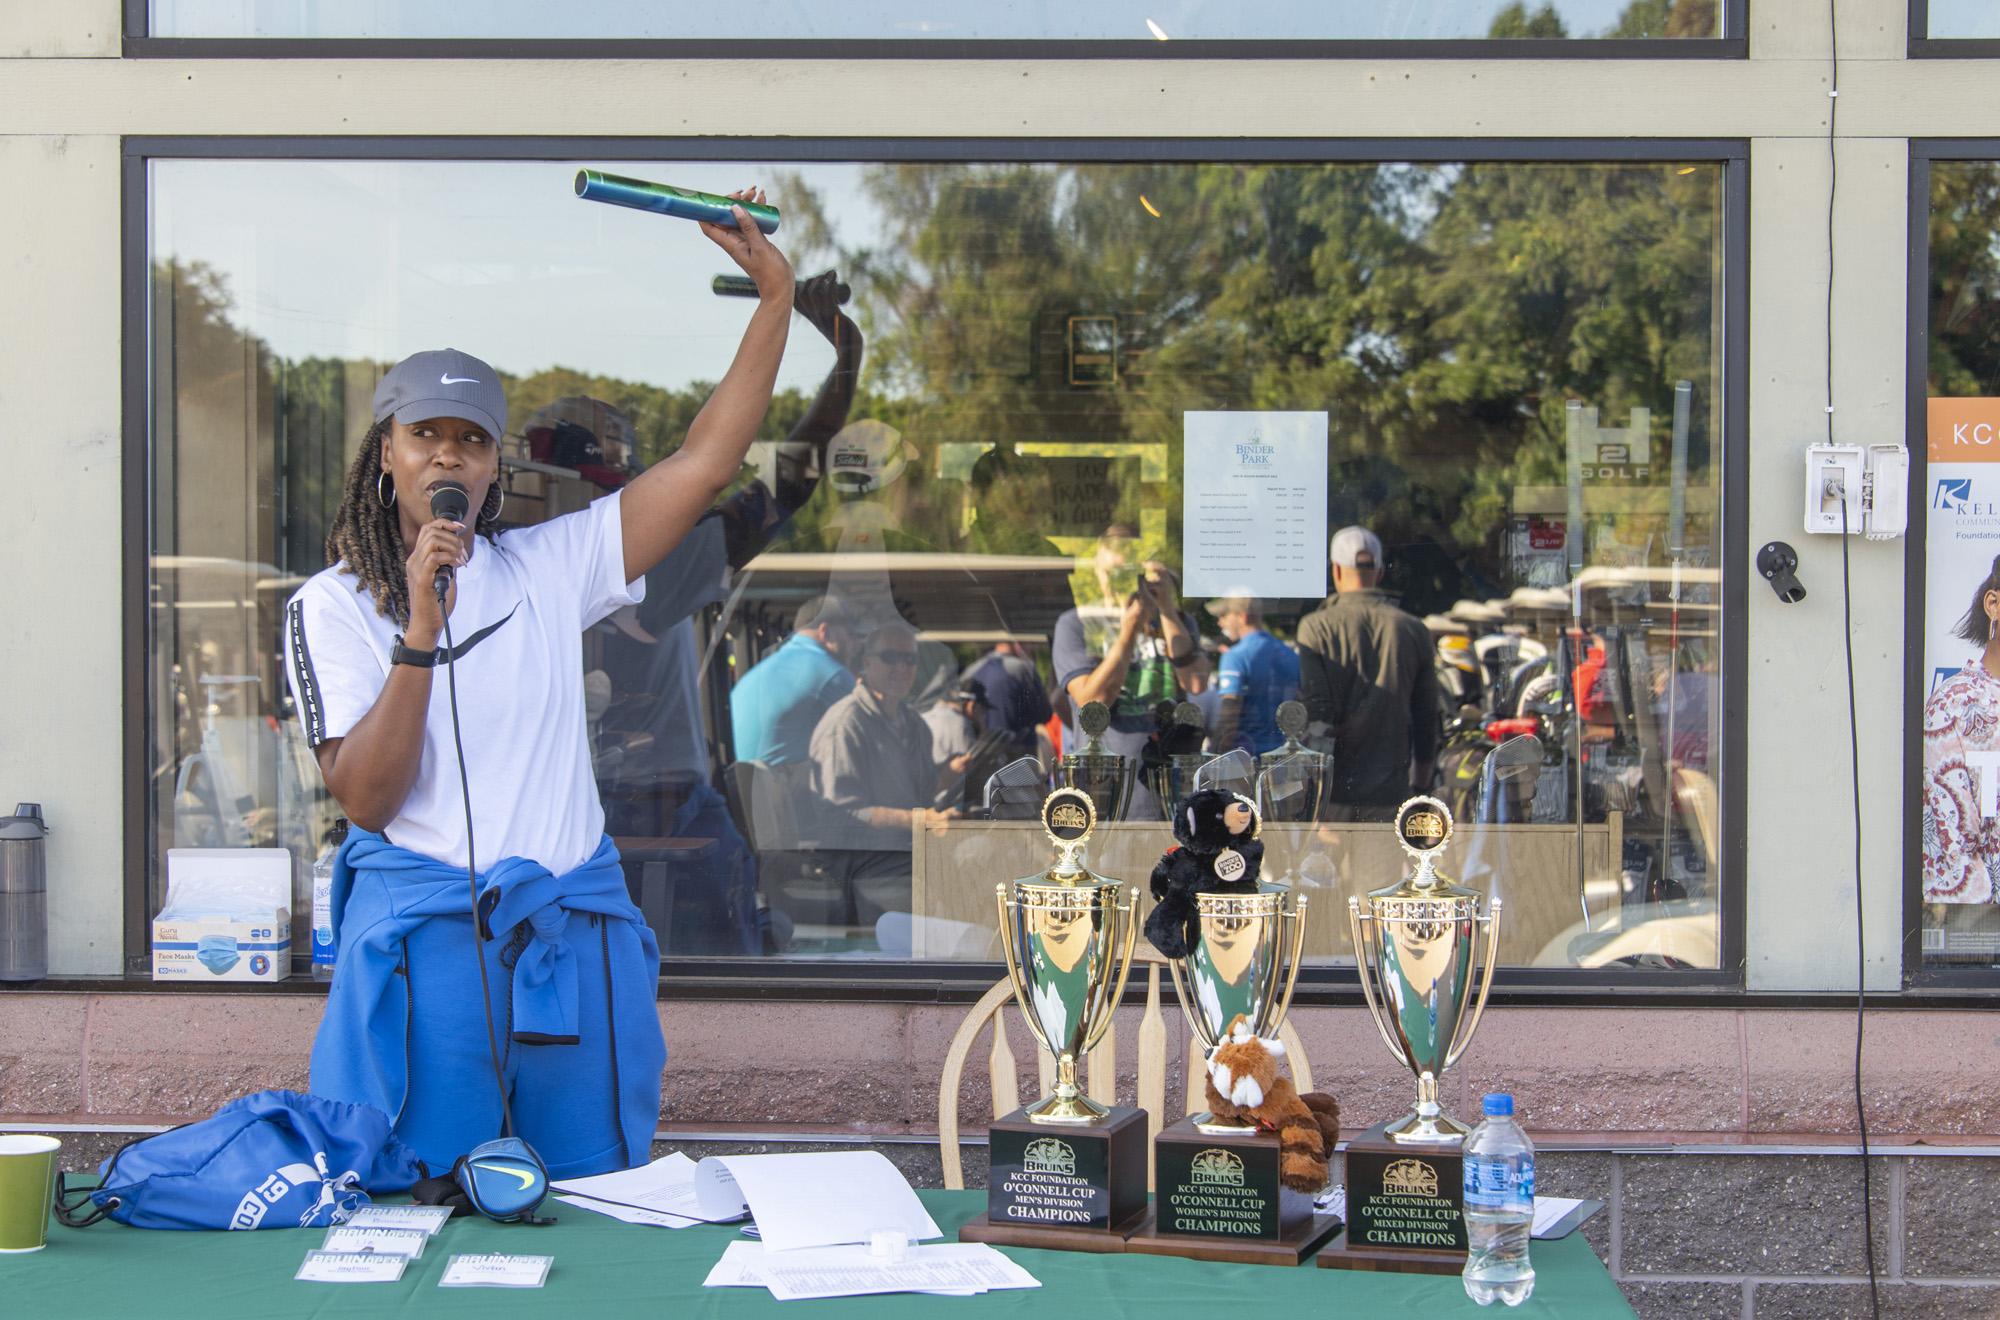 KCC President Dr. Adrien Bennings addresses golfers before the start of the 24th annual Bruin Scholarship Open on Sept. 10.